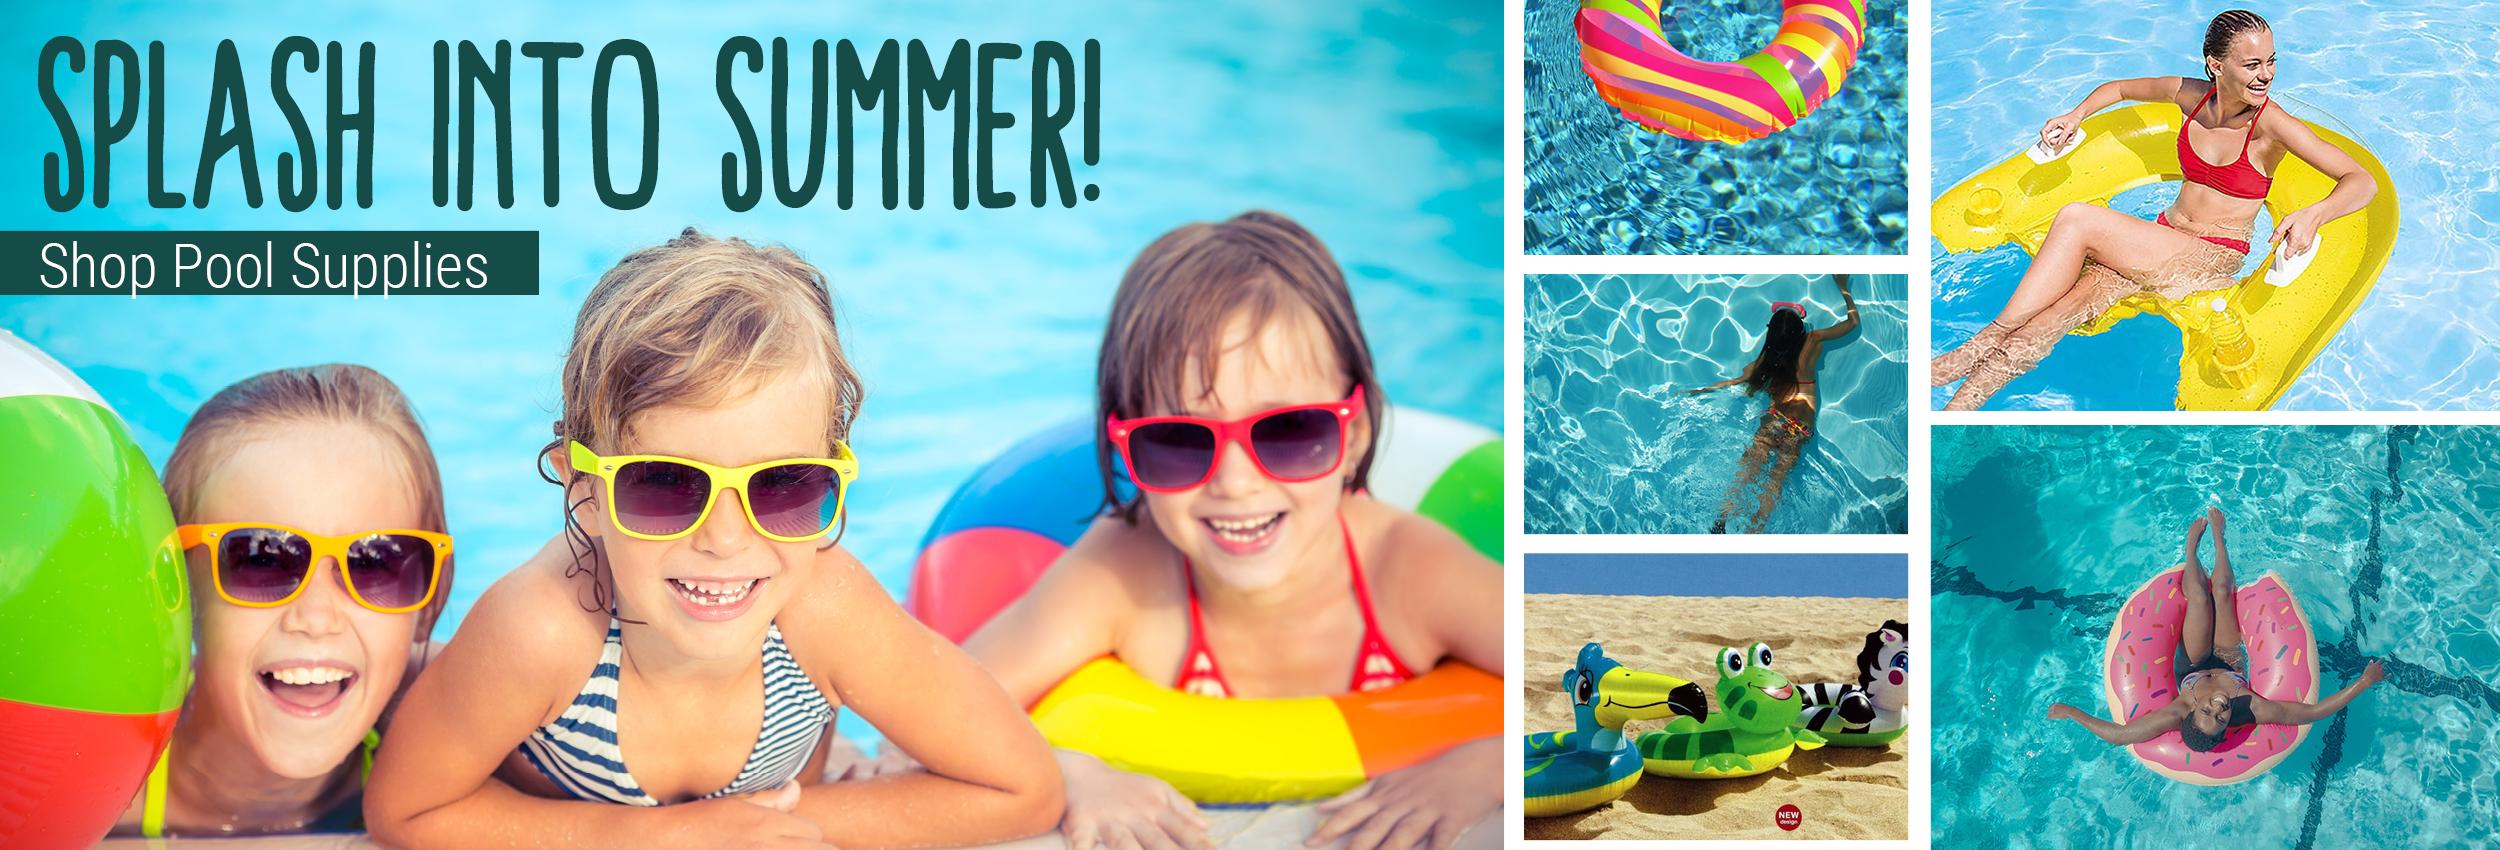 Splash Into Summer! Shop Pool Supplies